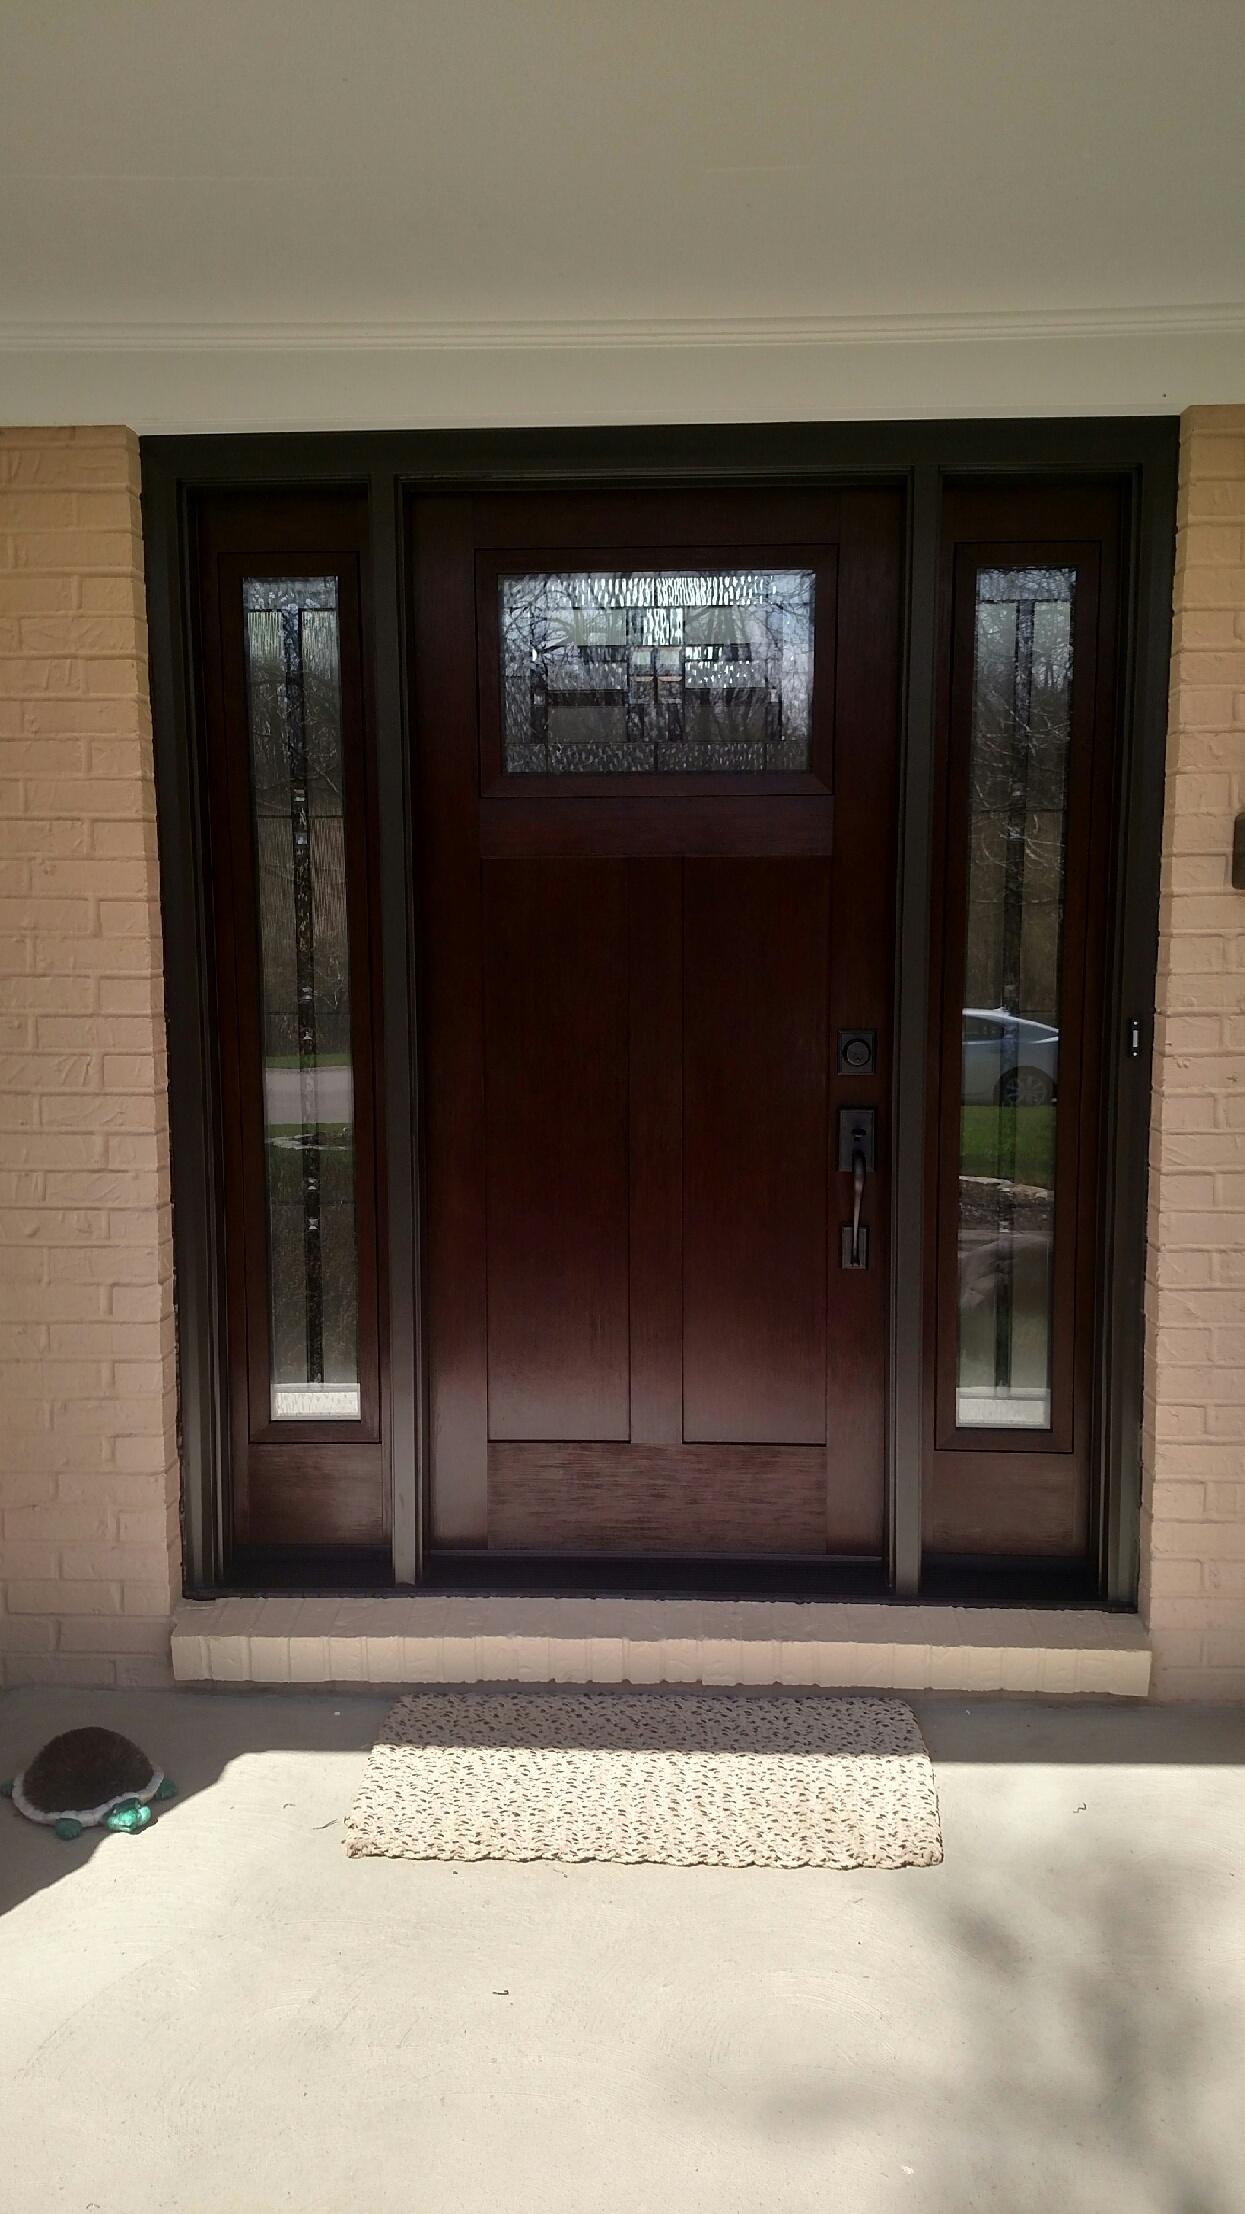 Sharonville S Front Door Friday Post By Jfk Window And